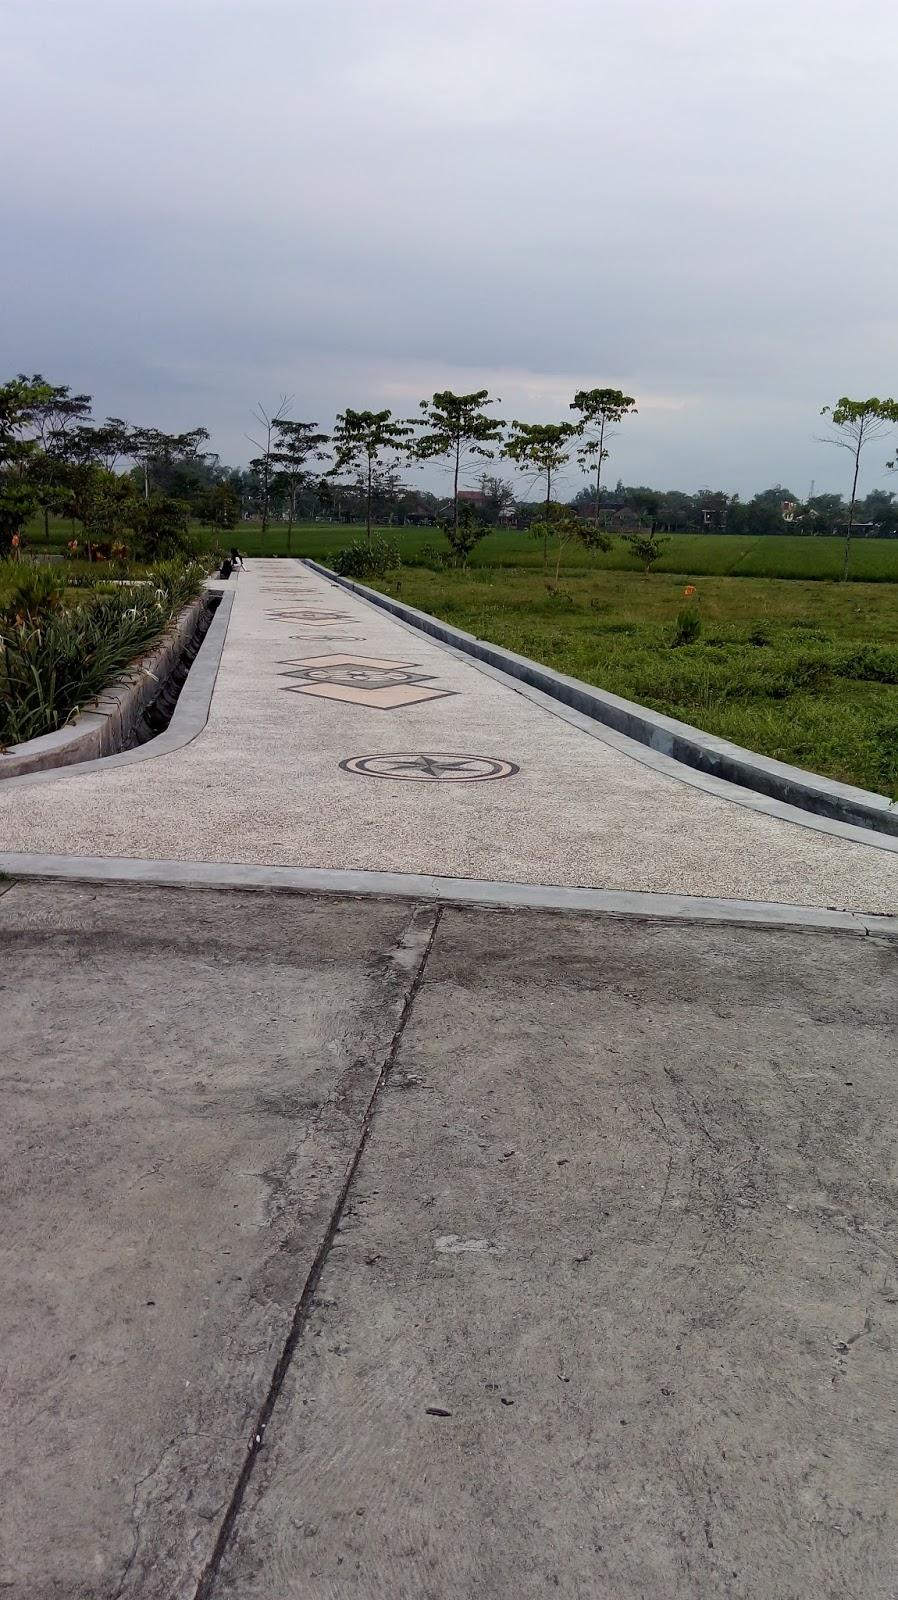 Nodiwa Sore Indah Taman Pandan Wilis Kabupaten Nganjuk Terlihat Cukup